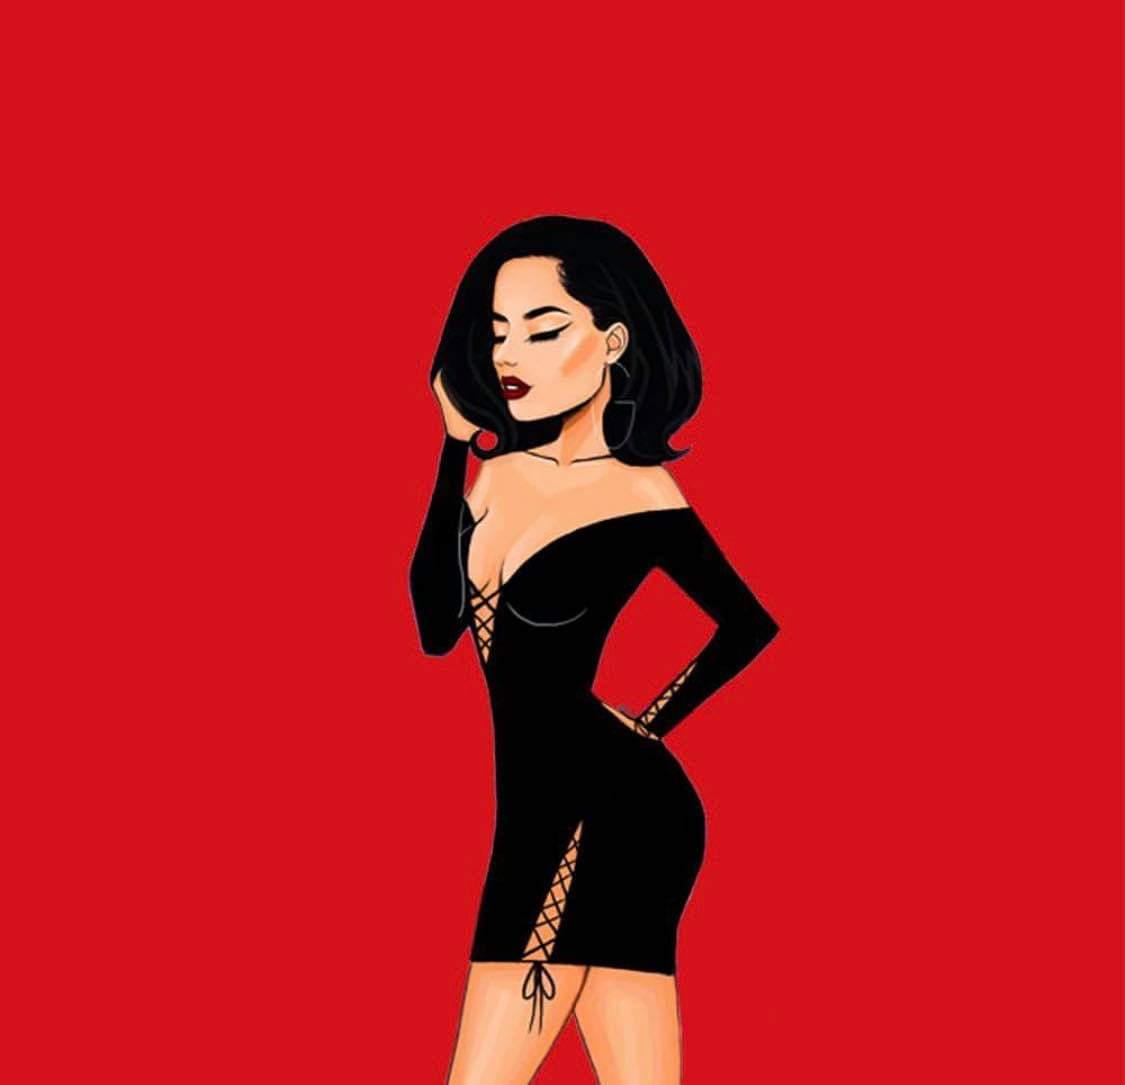 Sexy isn't a shape,it's an attitude! #girlsfromstudio20 #womanwithclass pic.twitter.com/JoDKGpXEP8